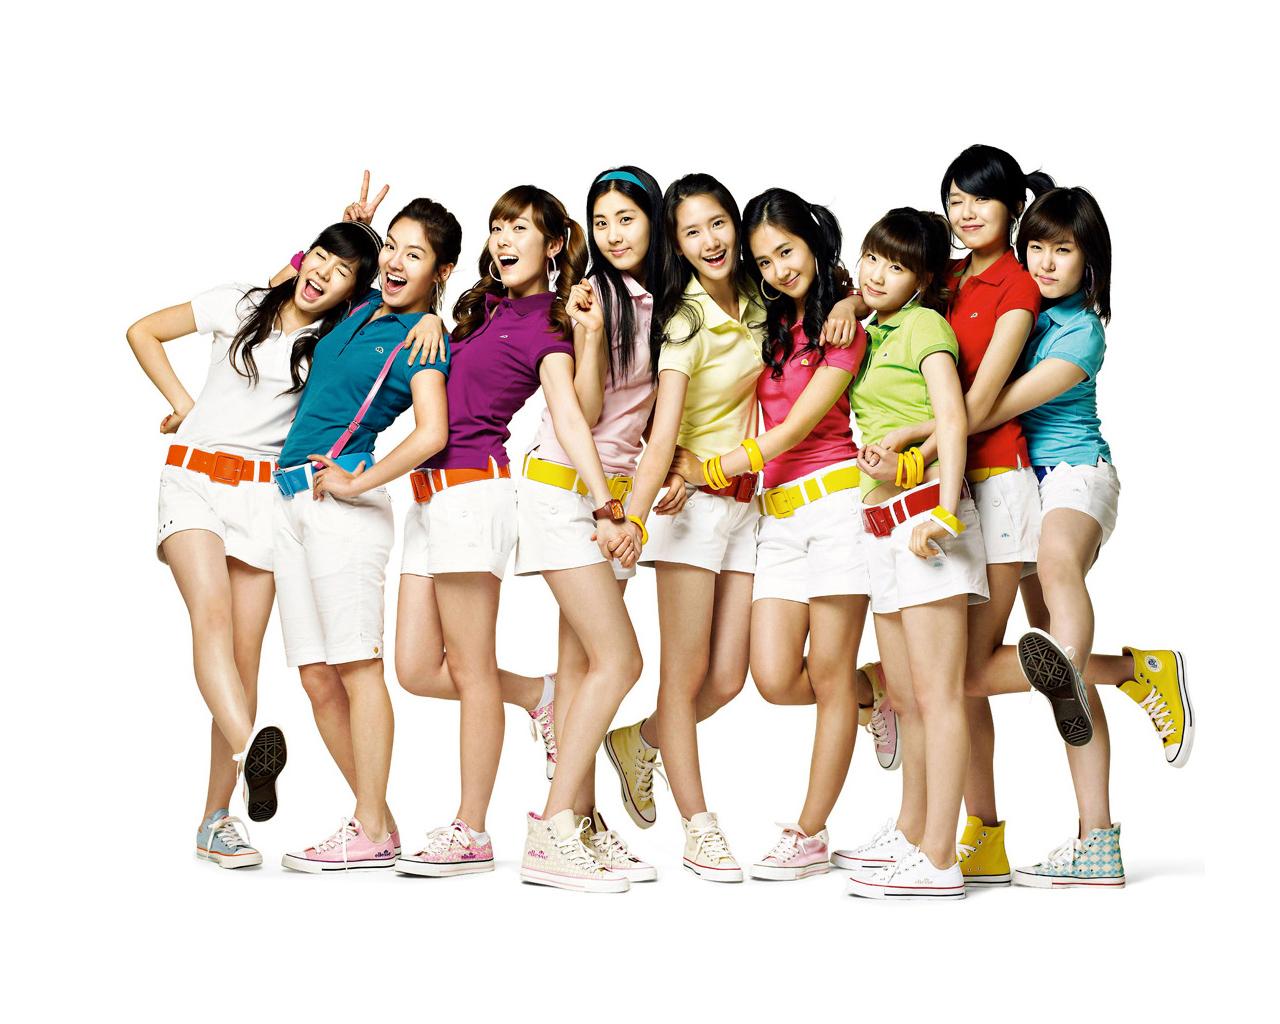 Free Download Snsd Funny Korean Girls Group Kpop Celebrities